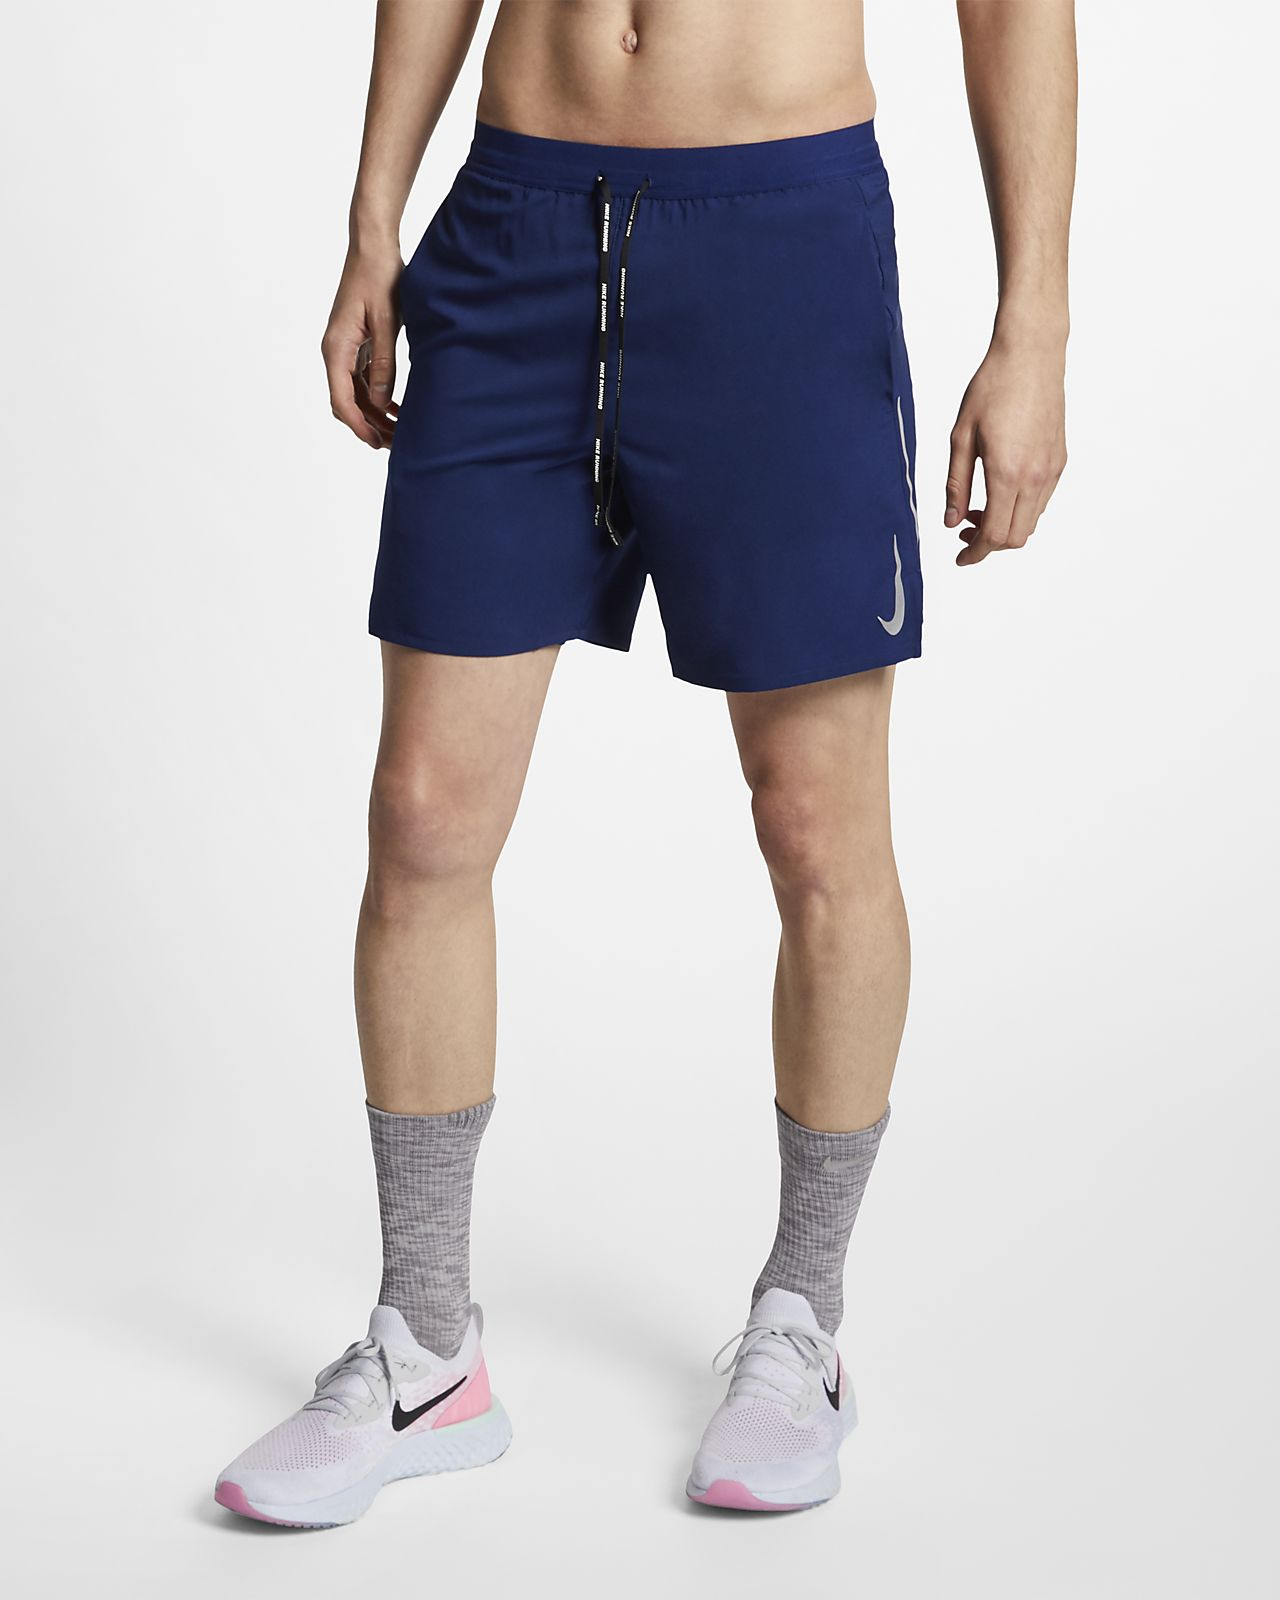 ee0b315200 ... Nike Dri-FIT Flex Stride Pantalón corto de running 2 en 1 de 18 cm